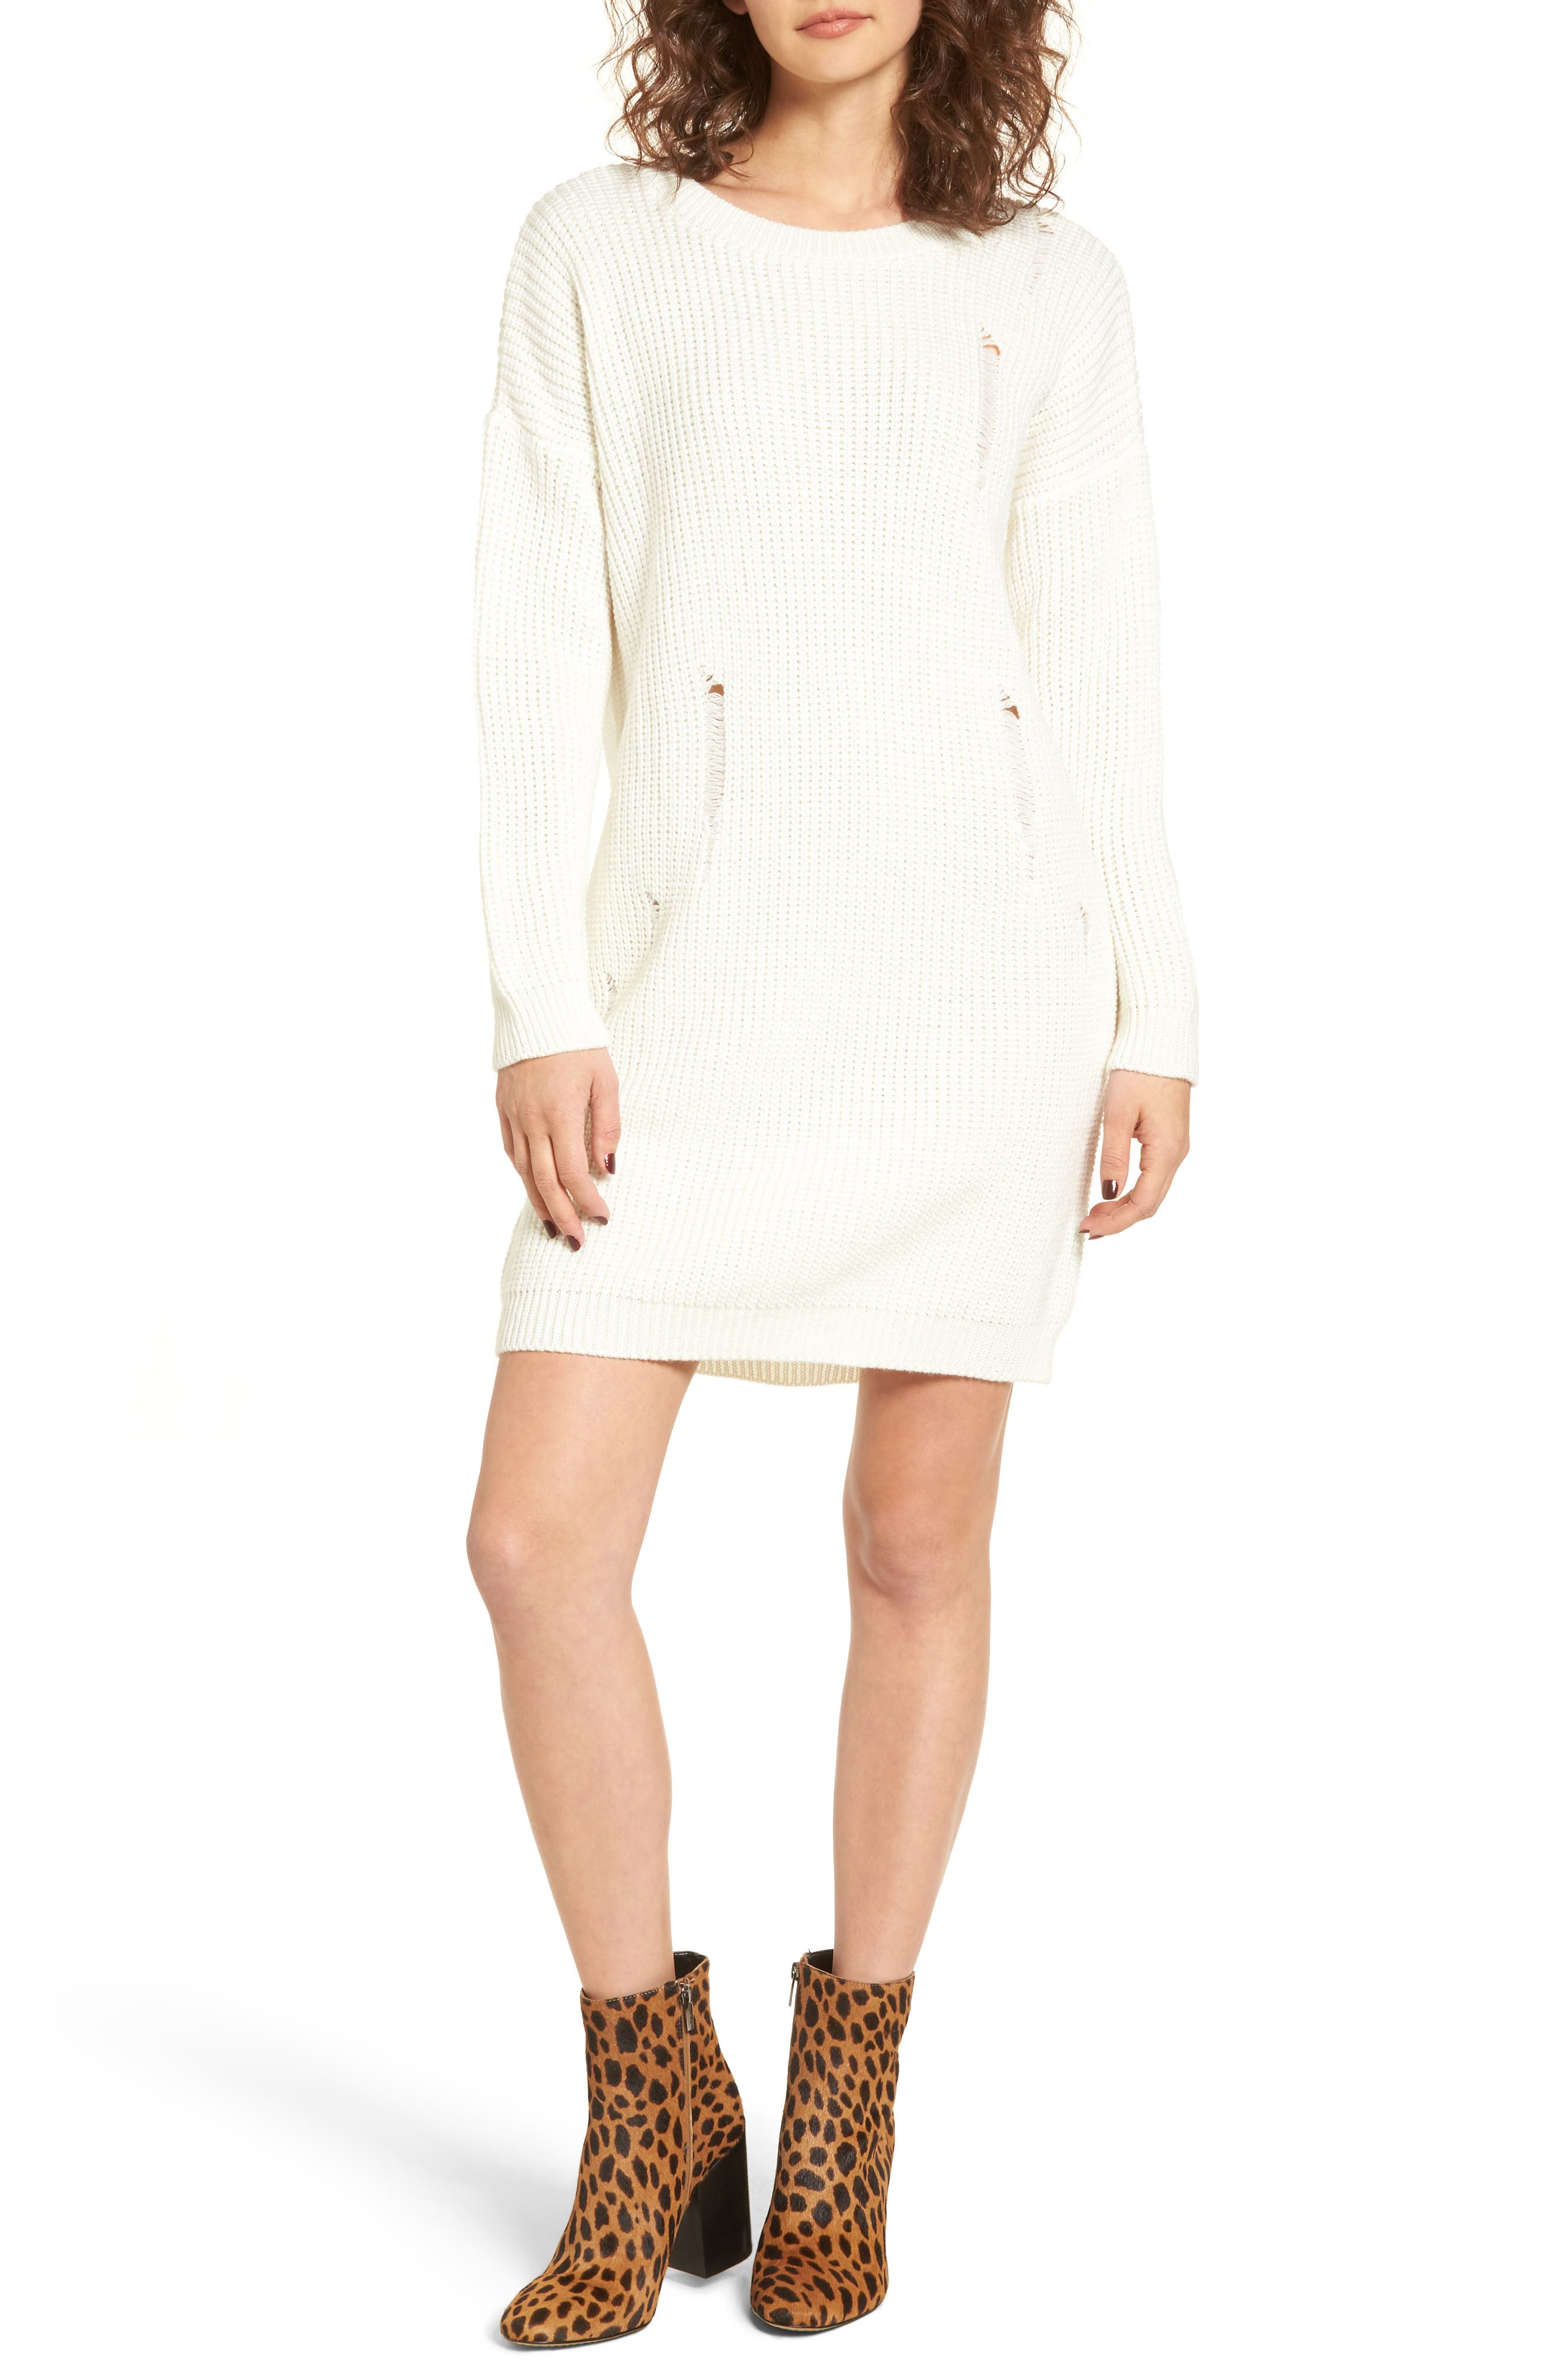 Alternate Image 1 Selected - Cotton Emporium Distressed Sweater Dress